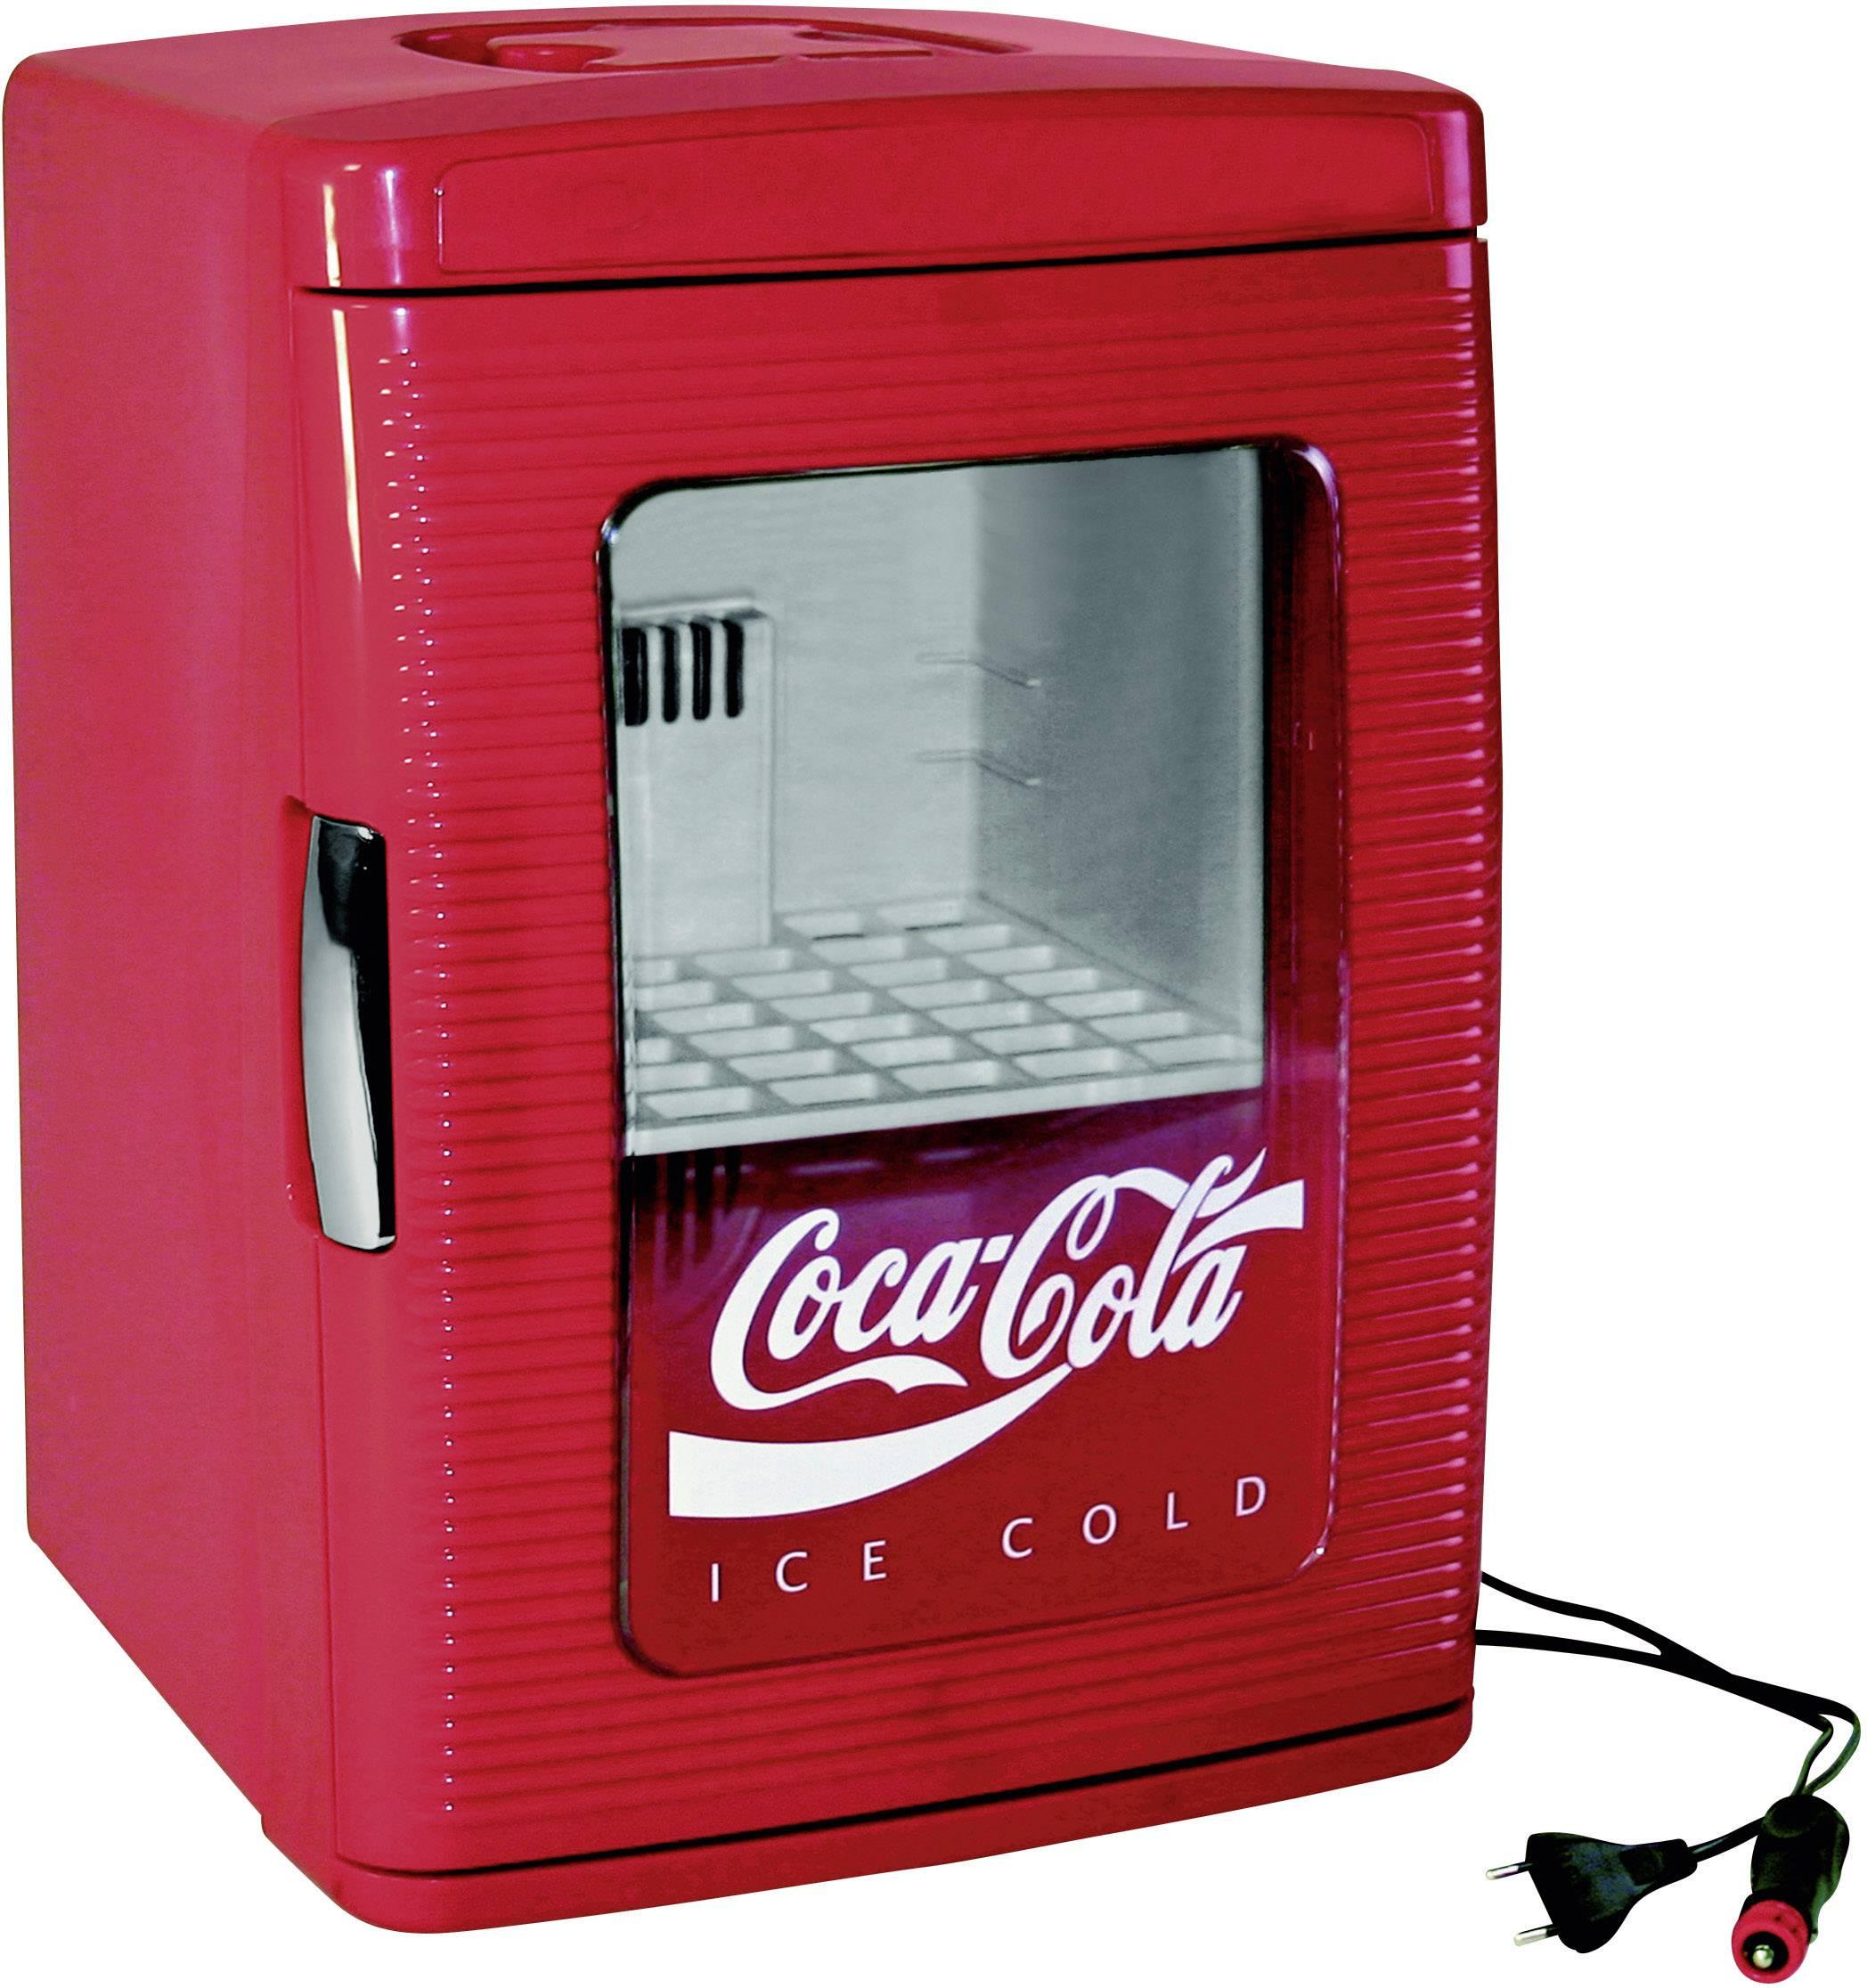 Verwonderend Mini-koelkast Thermo-elektrisch Coca-Cola MF25 12 V, 230 V Rood 23 ZD-07